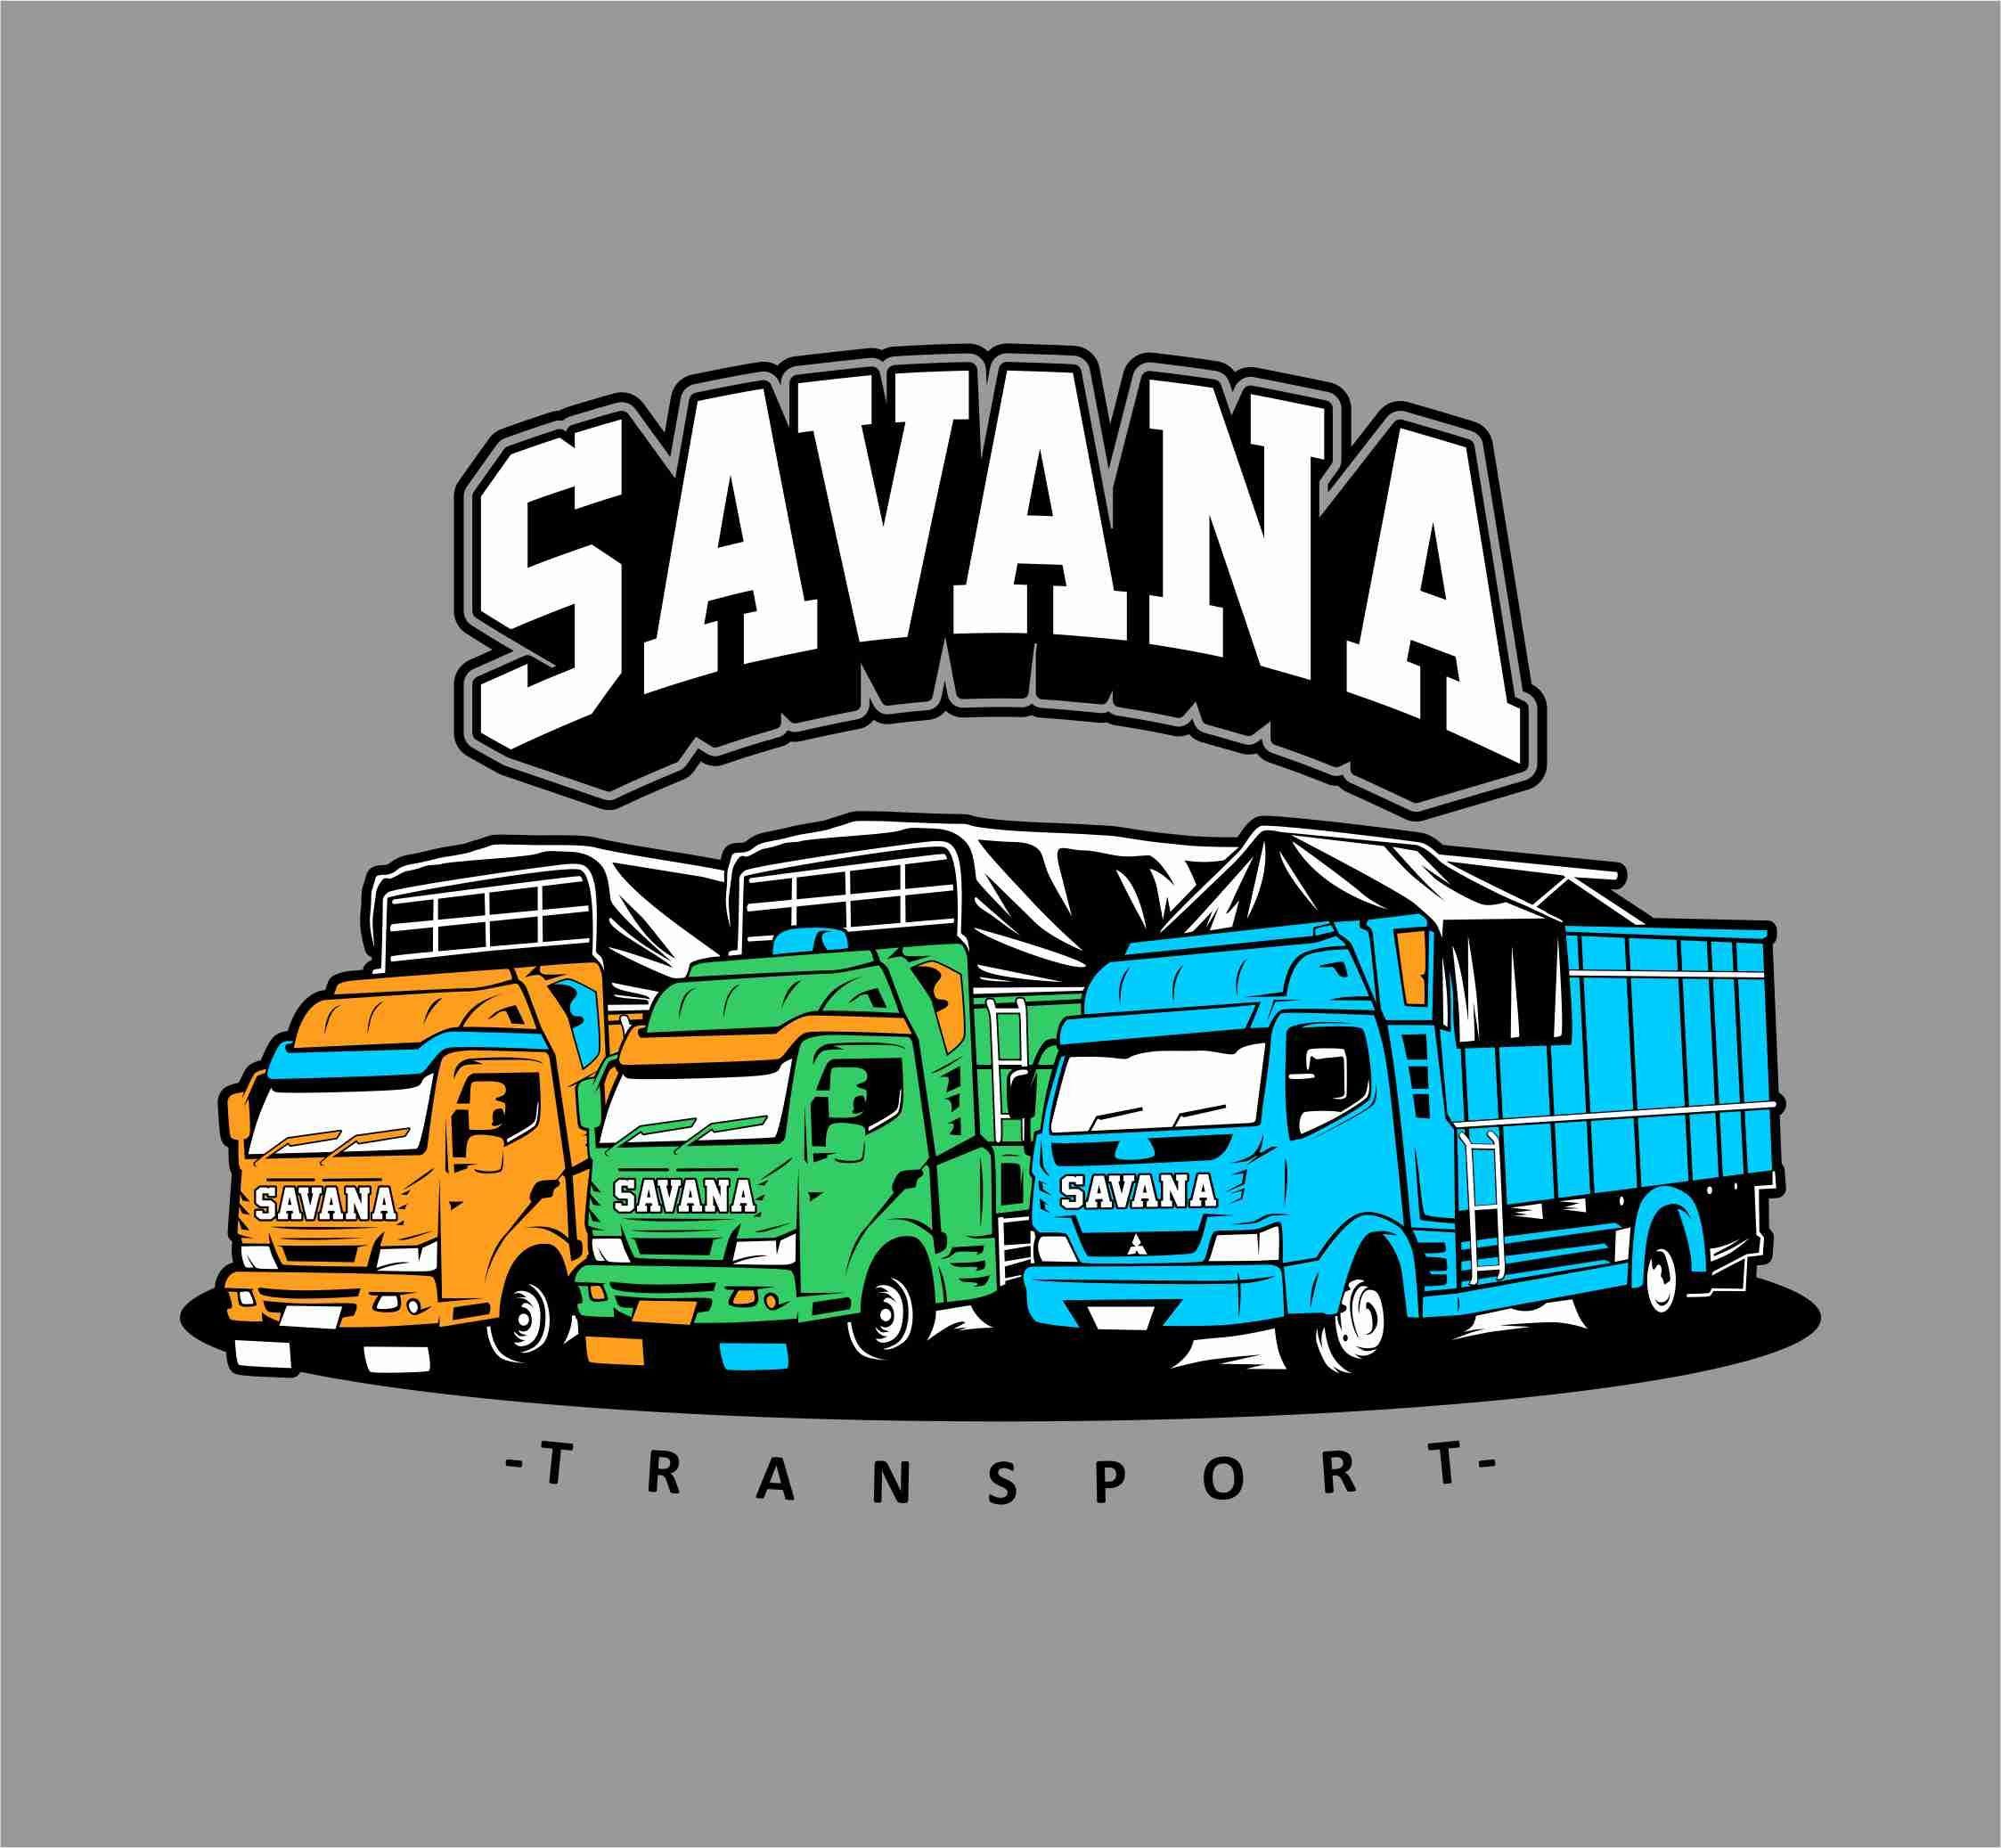 Truk Vector Savana Transport Konsep Mobil Desain Kartun